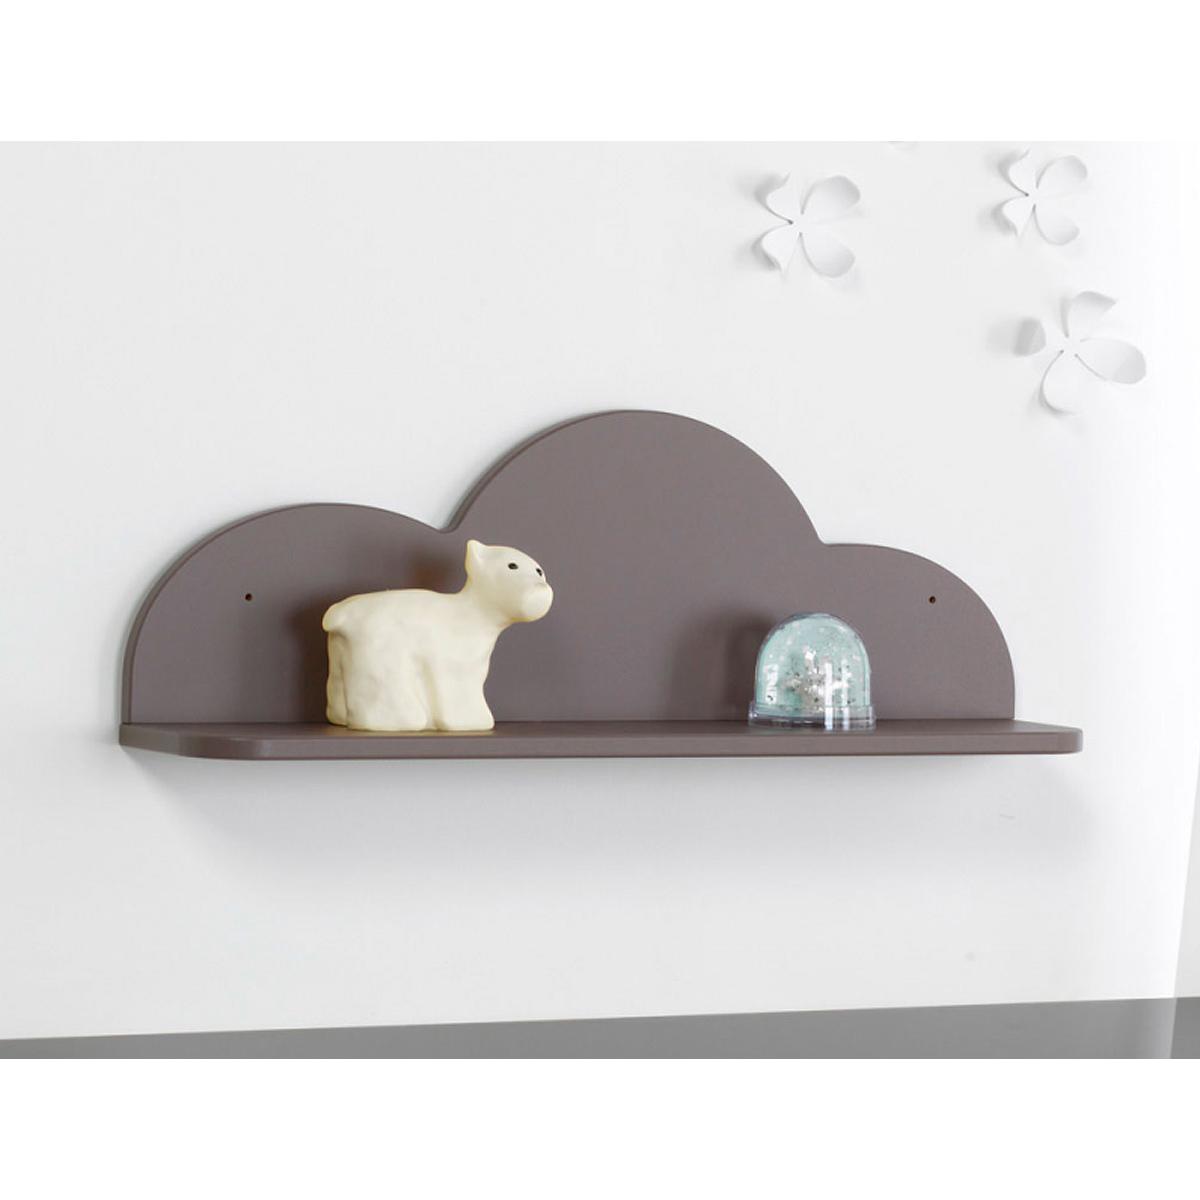 etag re murale b b provence alt a taupe rangements etag re tendresse de b b. Black Bedroom Furniture Sets. Home Design Ideas